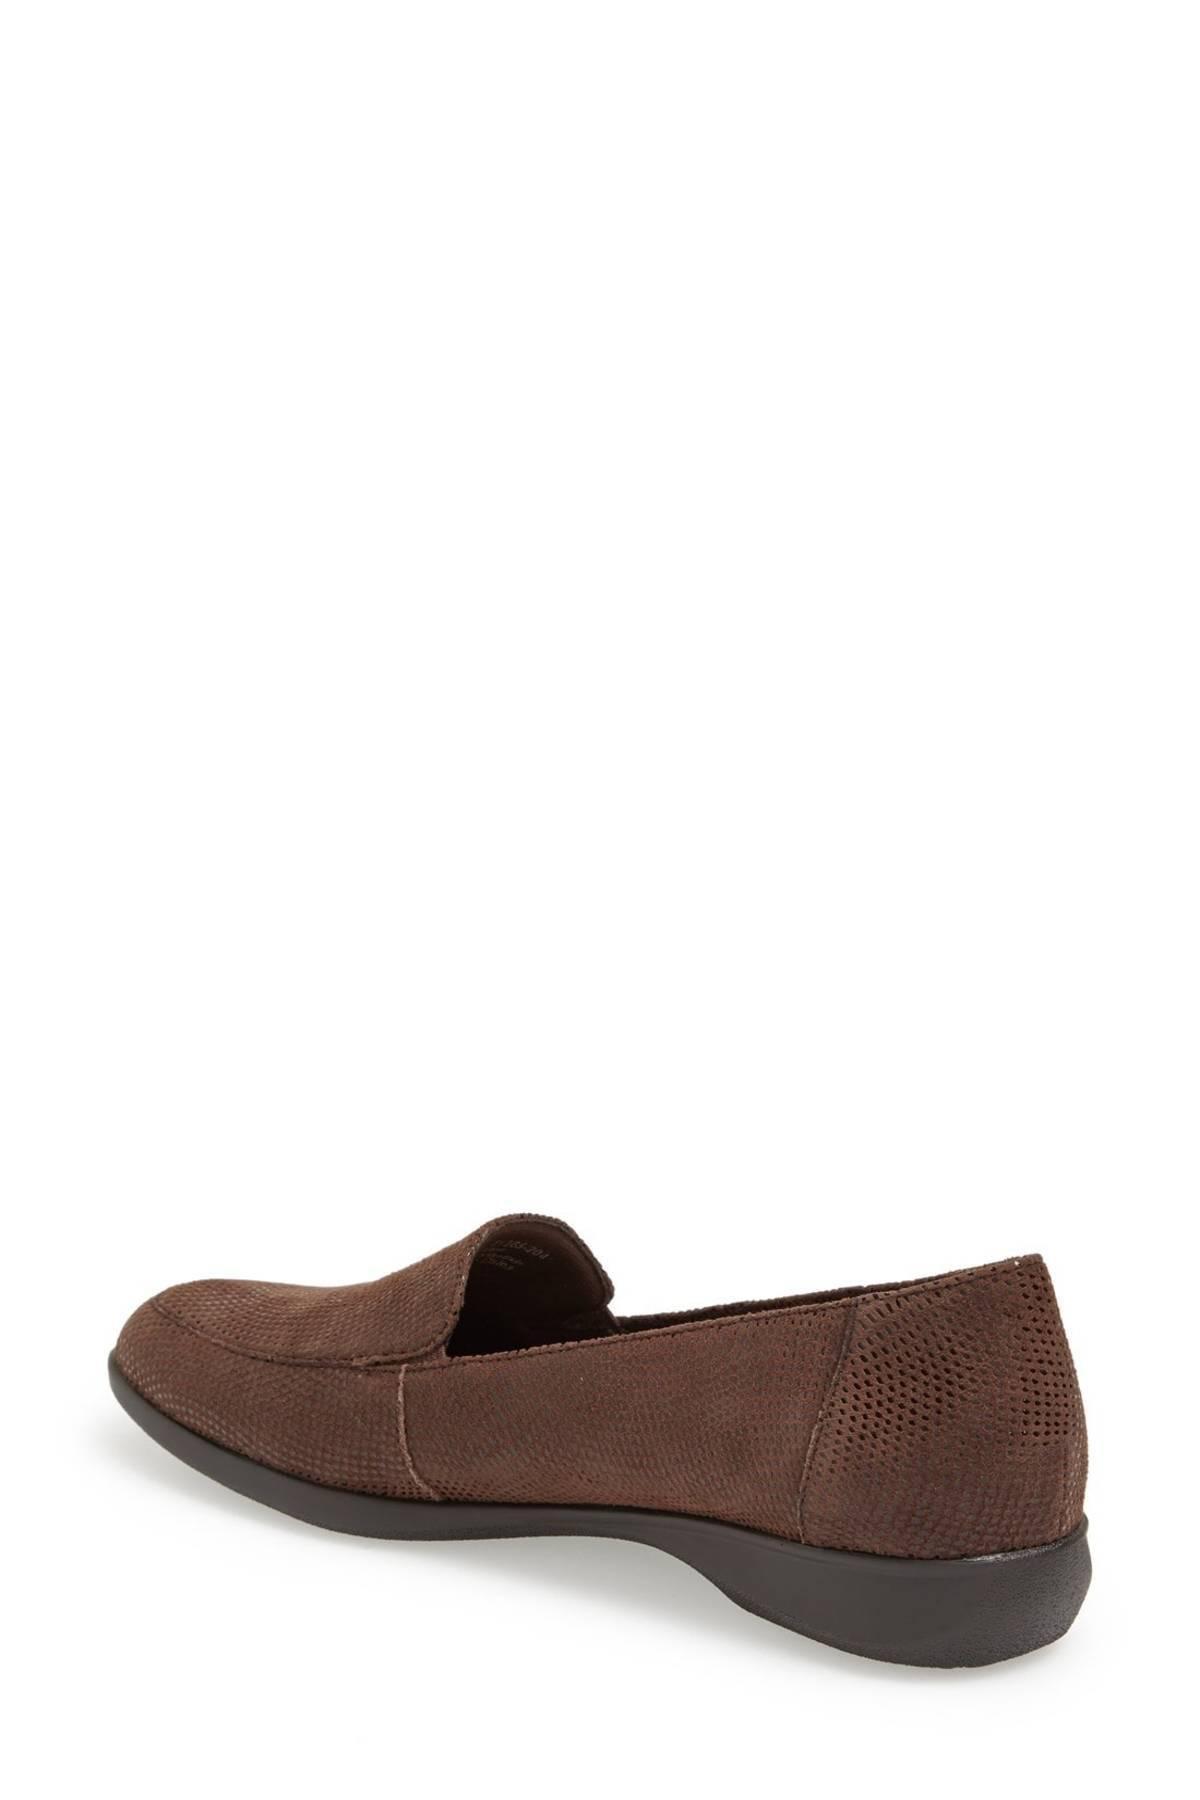 18b36f34f23 Lyst - Trotters  jenn  Loafer in Brown